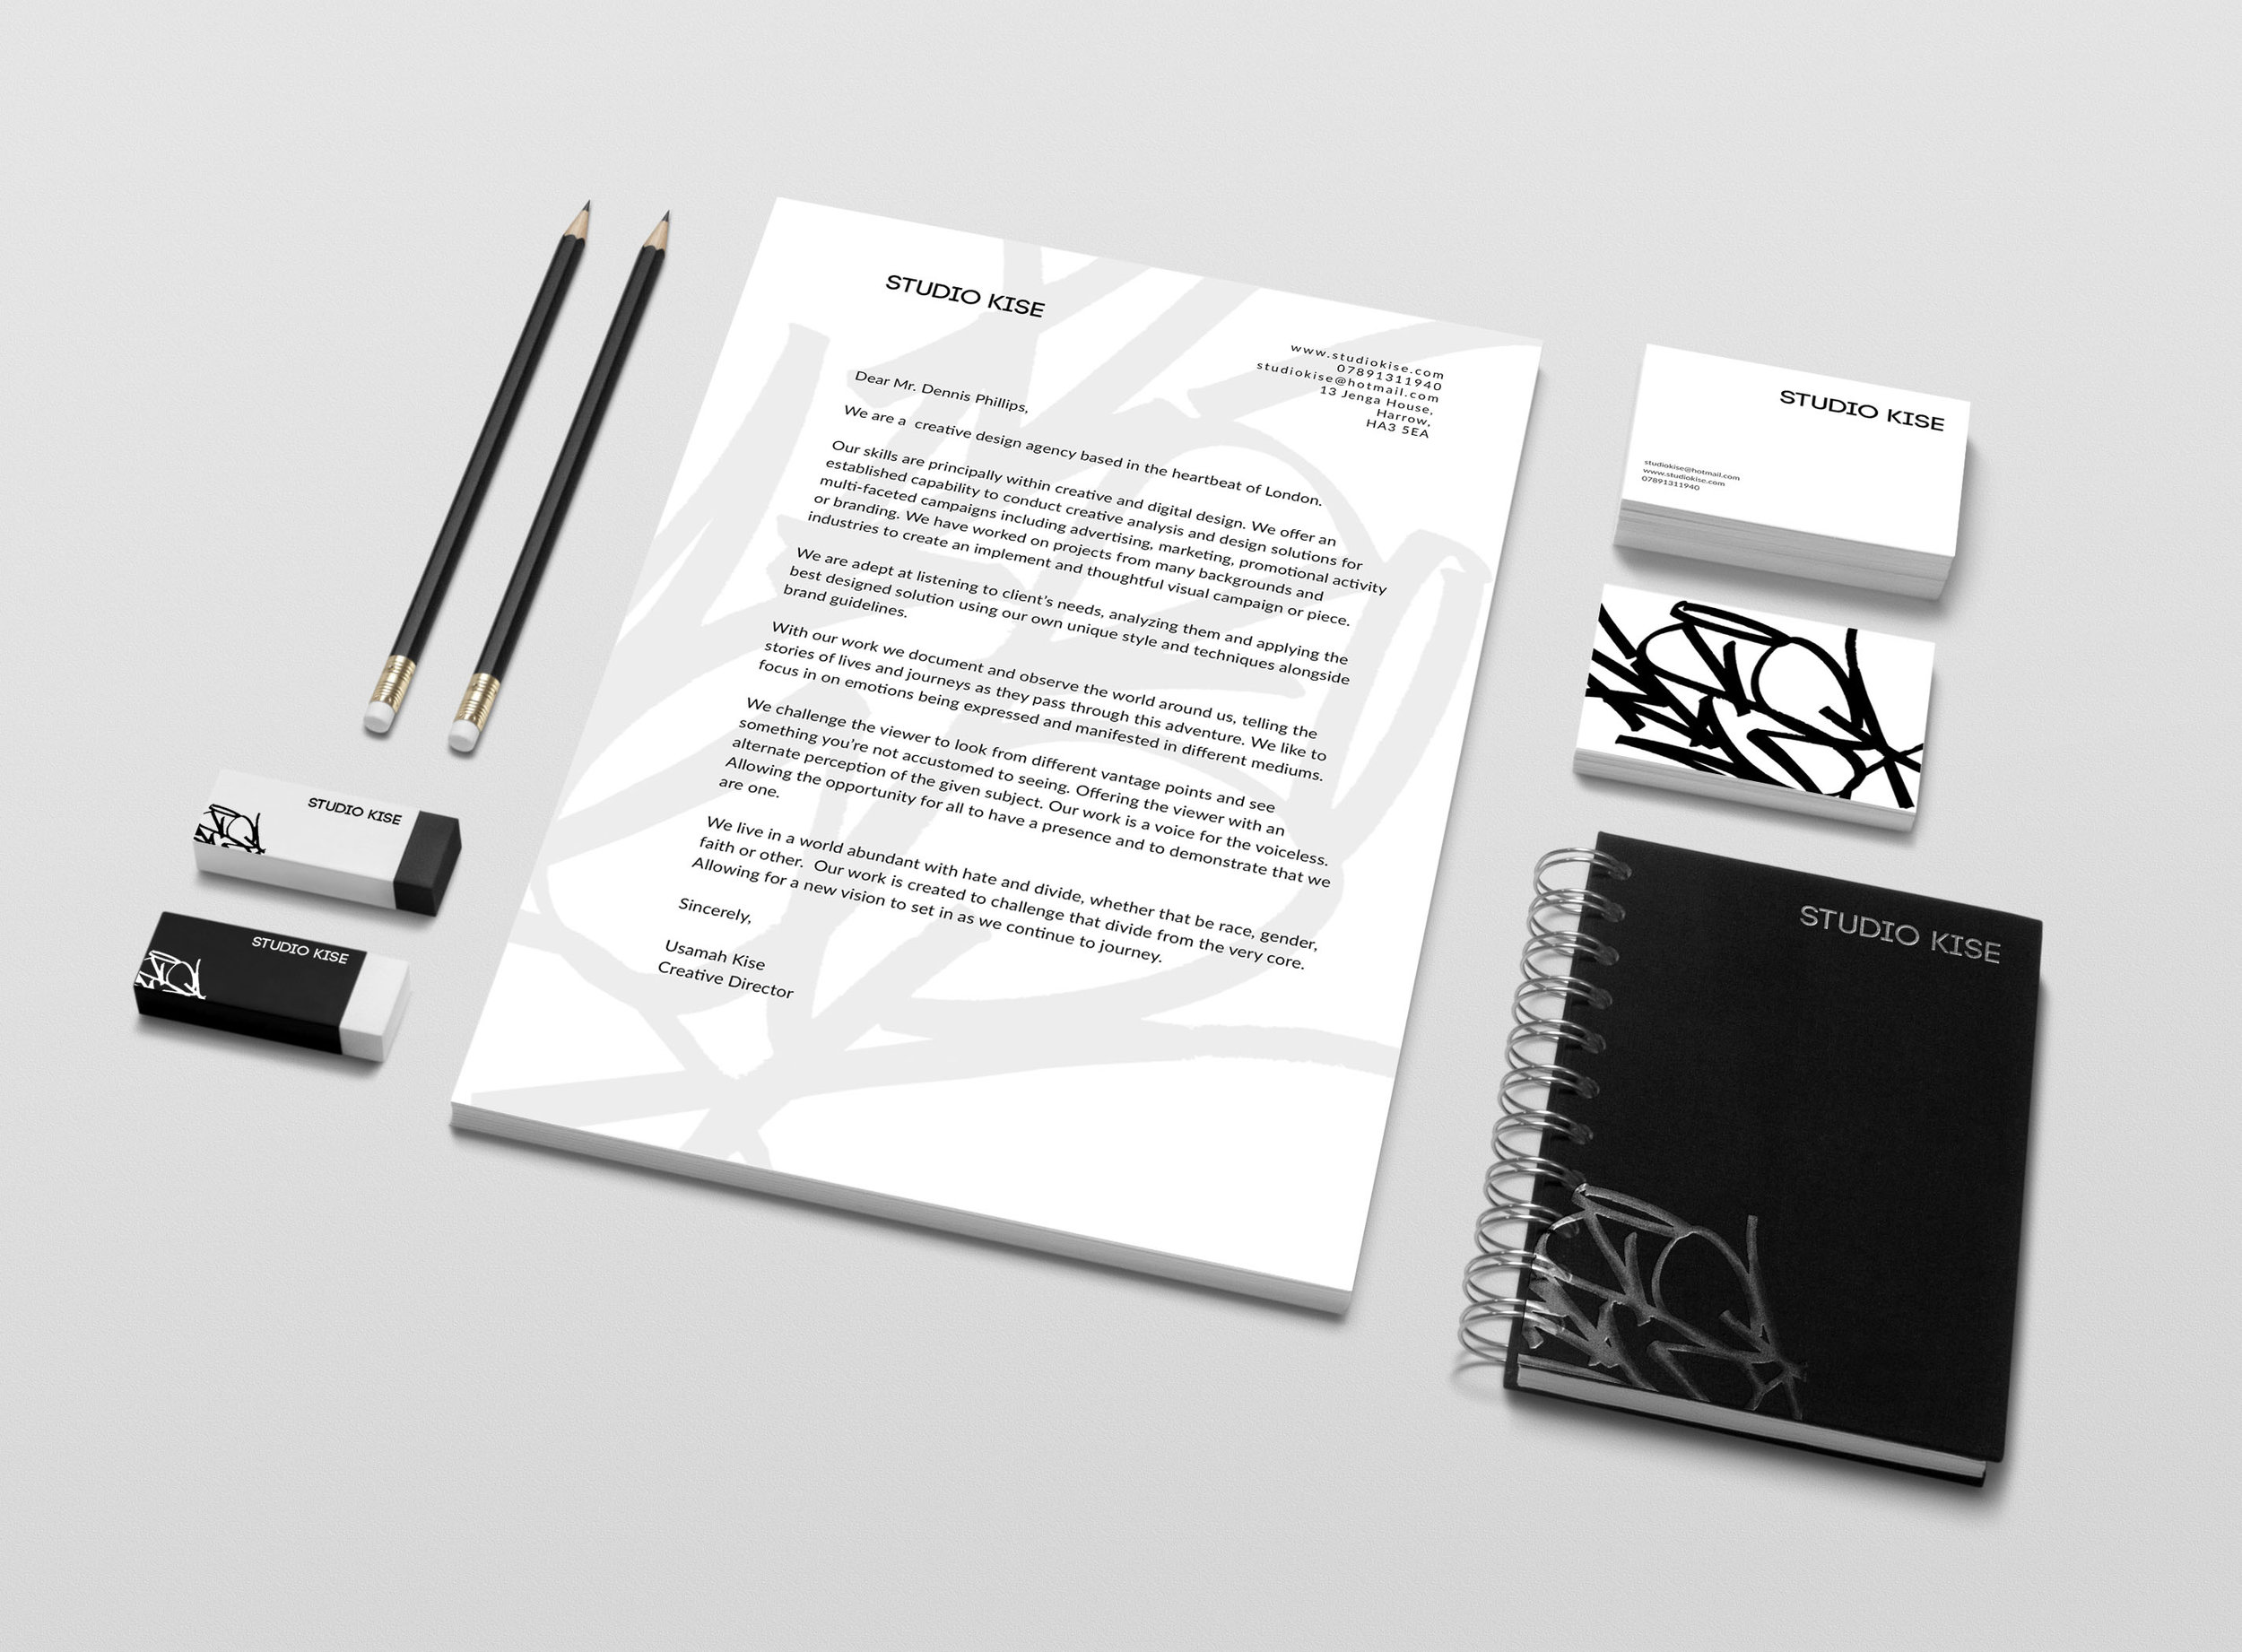 Branding-Identity-Mock-Up-5.jpg